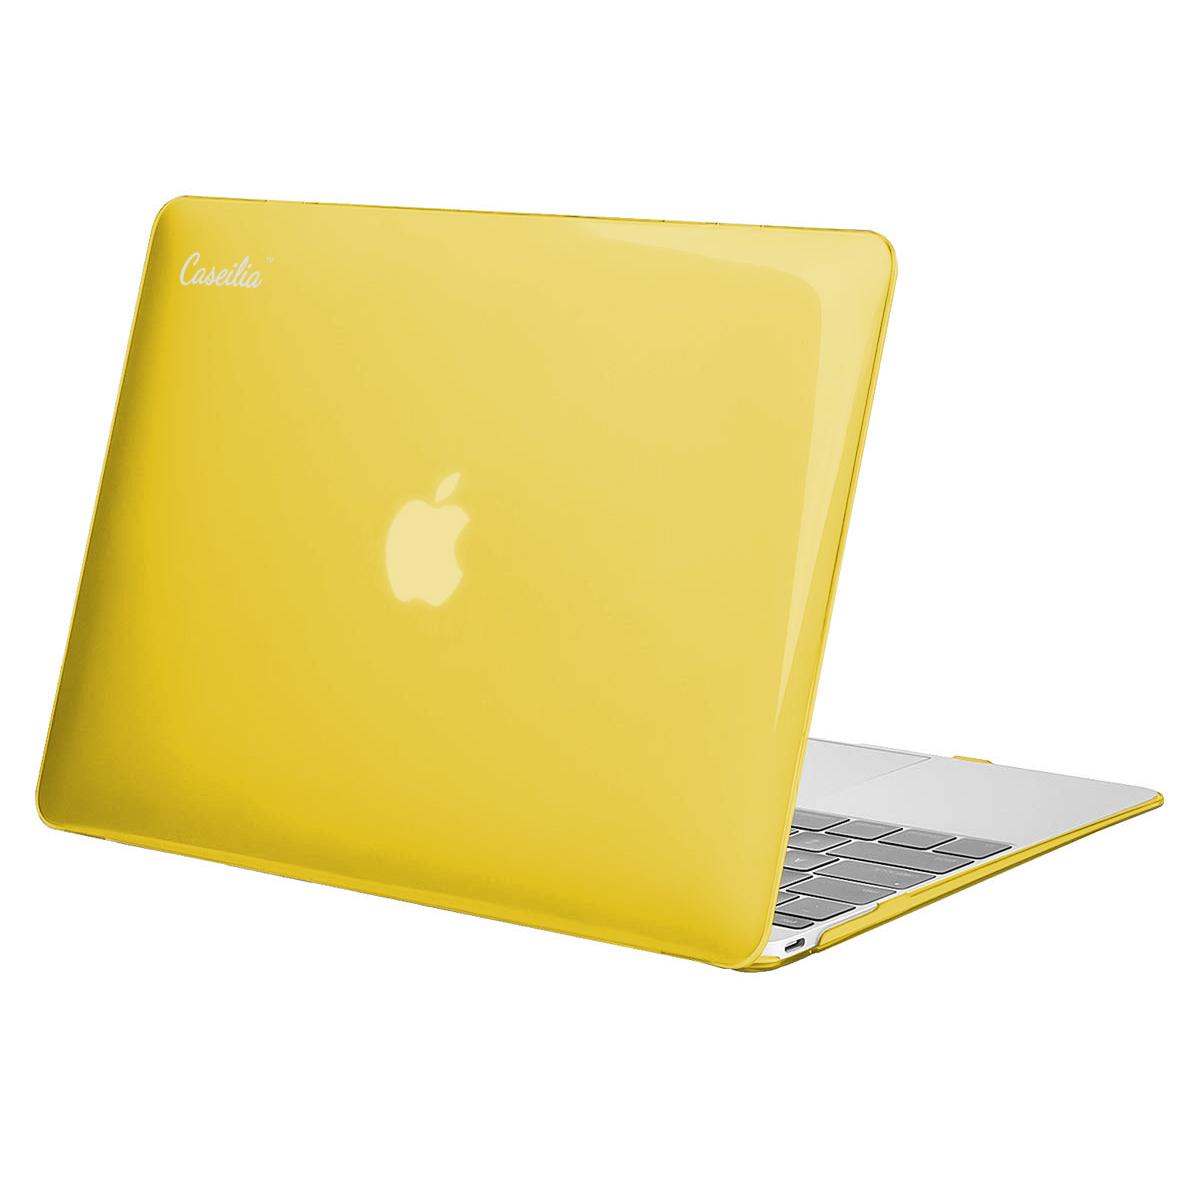 Caseilia_MacBook_CRYSTAL-yellow